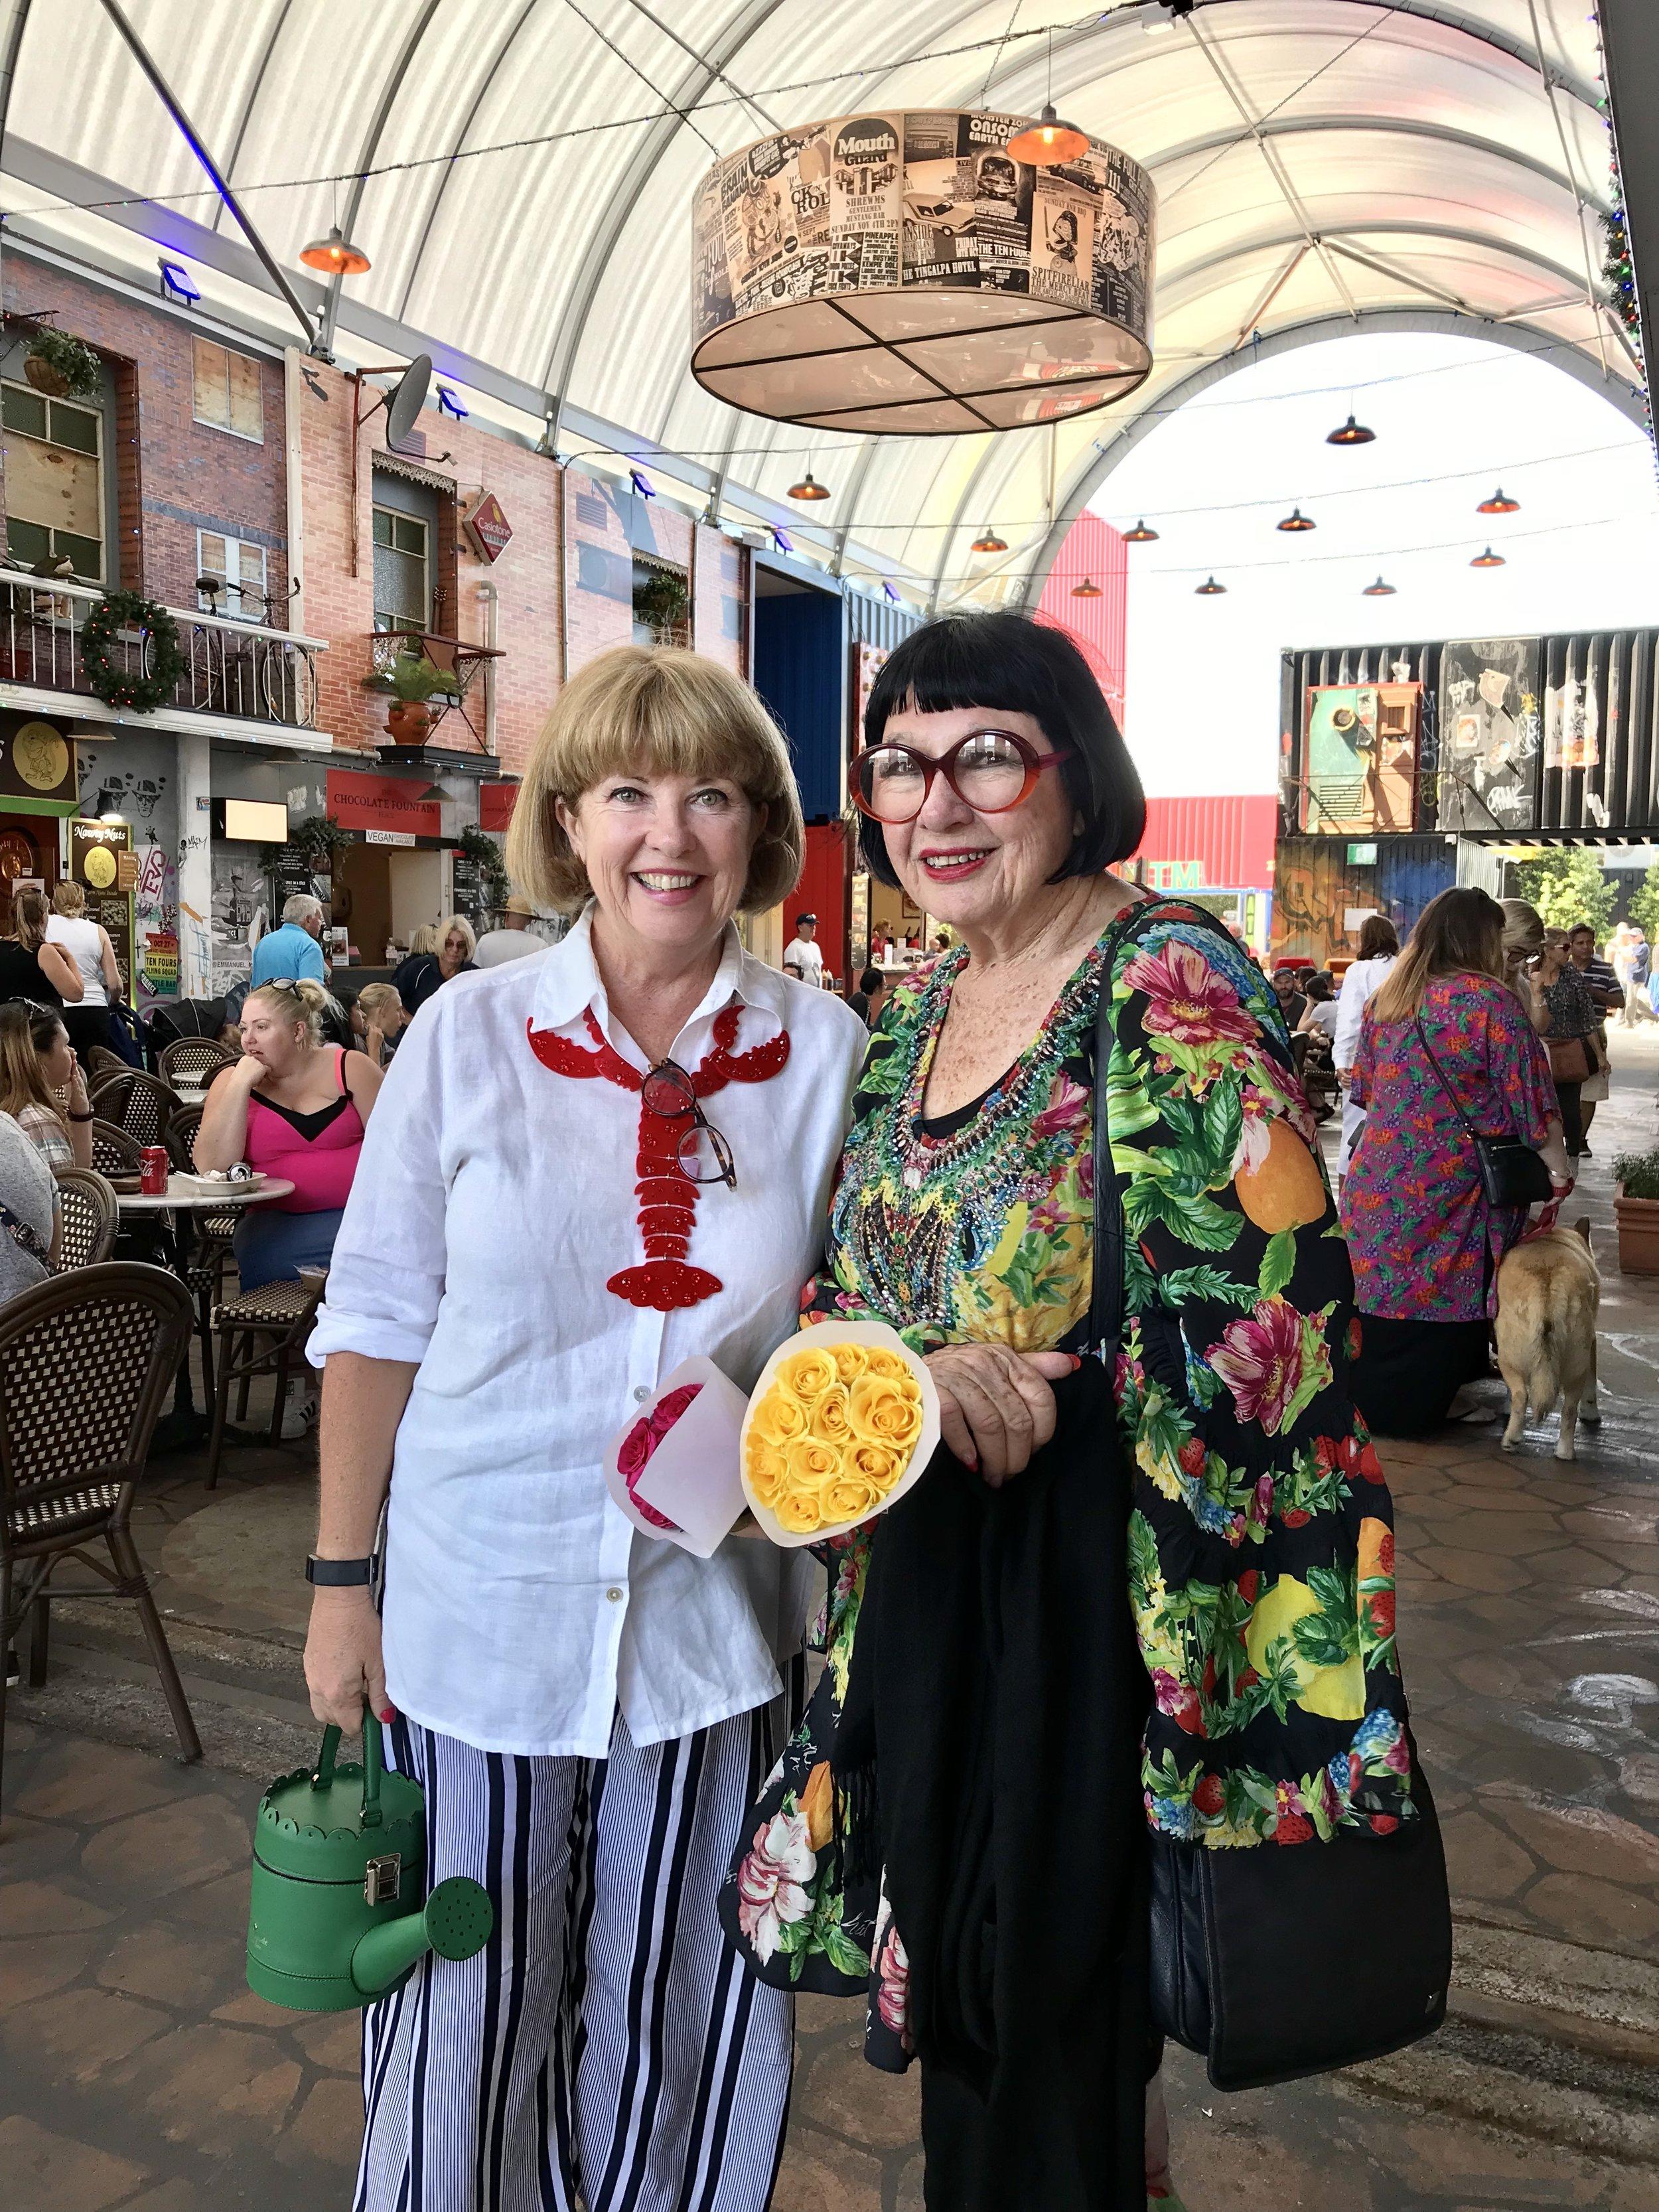 Jacki MacDonald and Peter Hackworth - Brisbane's Ladies of Eat Street